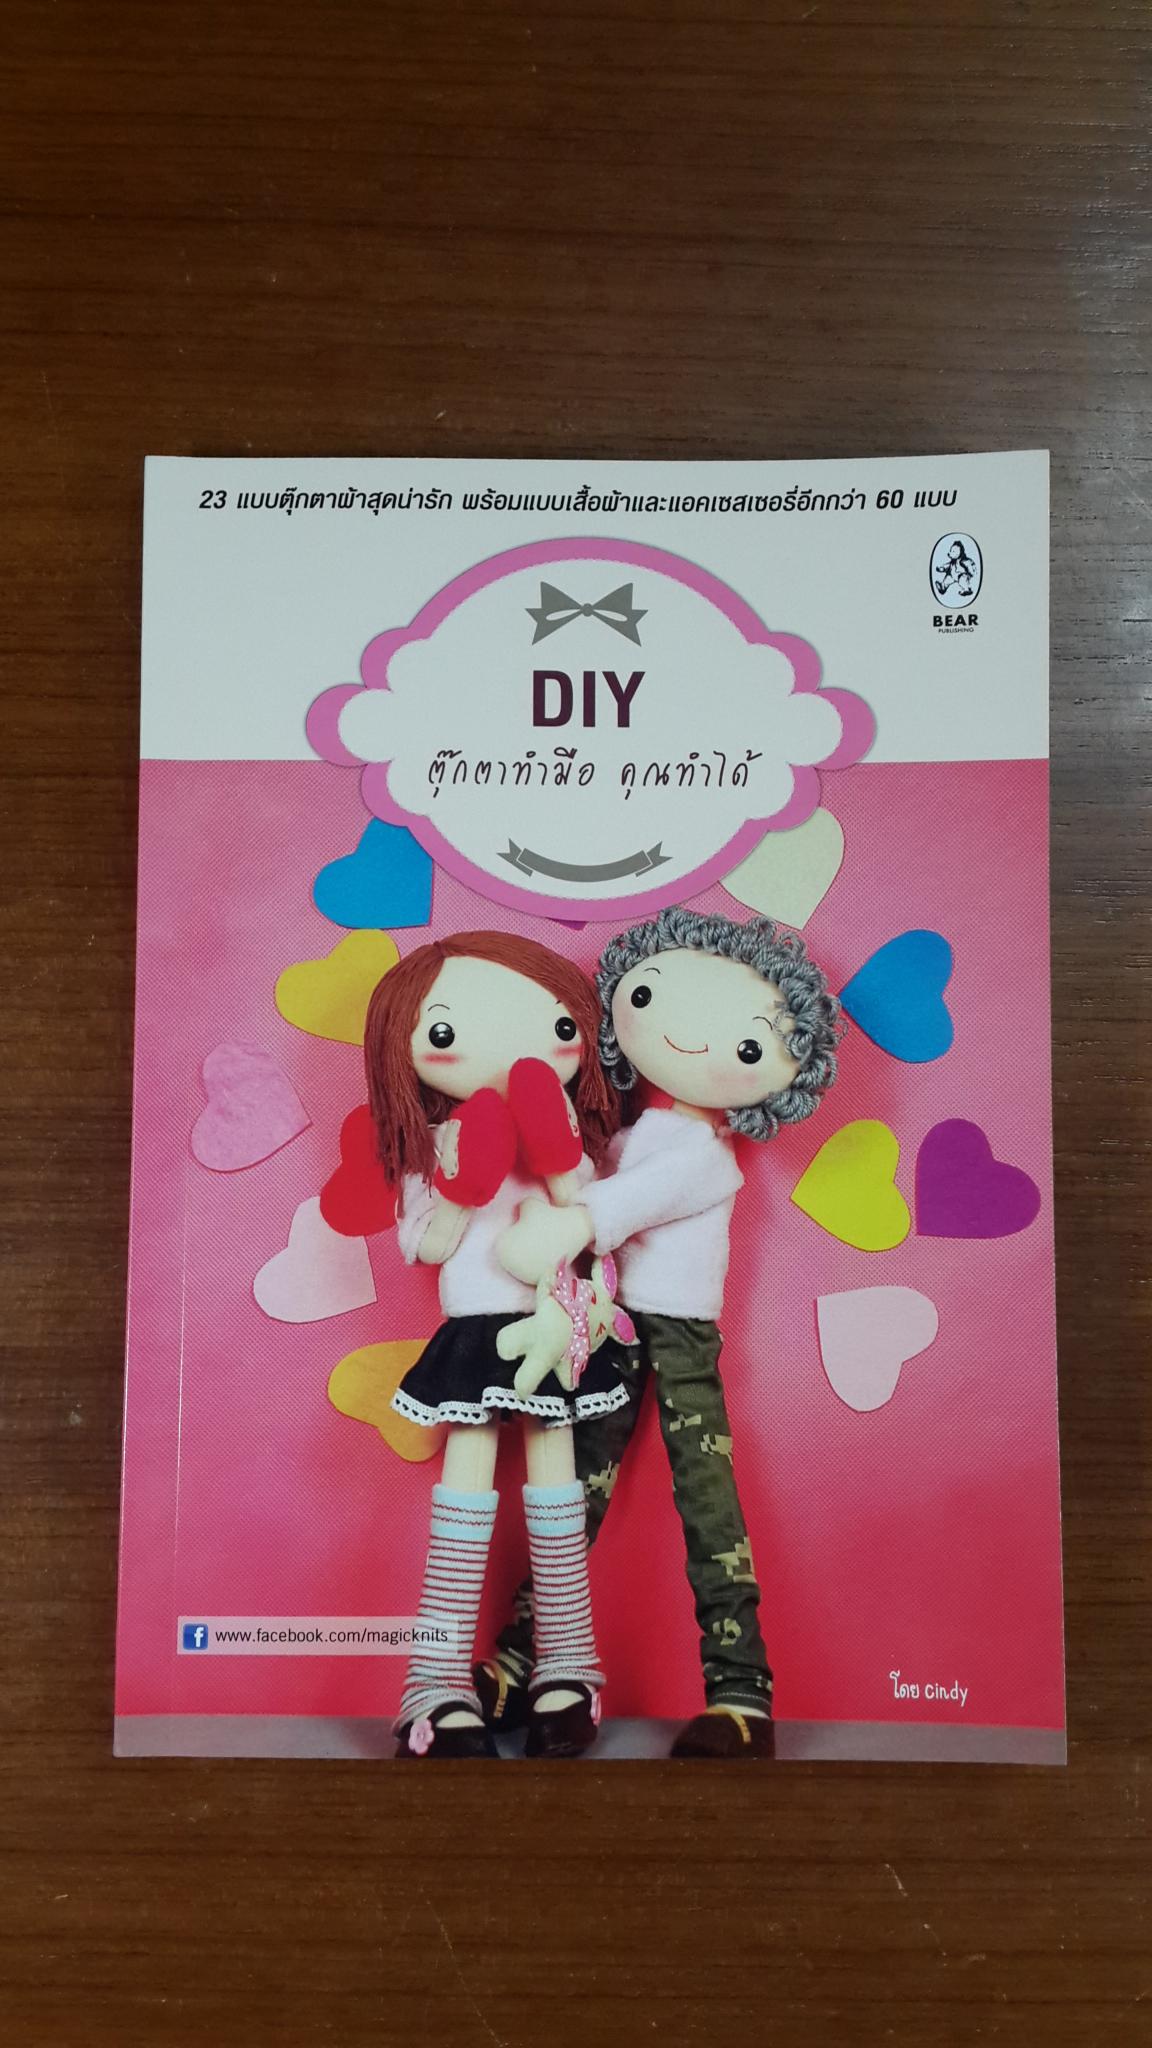 DIY ตุ๊กตาทำมือ คุณก็ทำได้ / Cindy